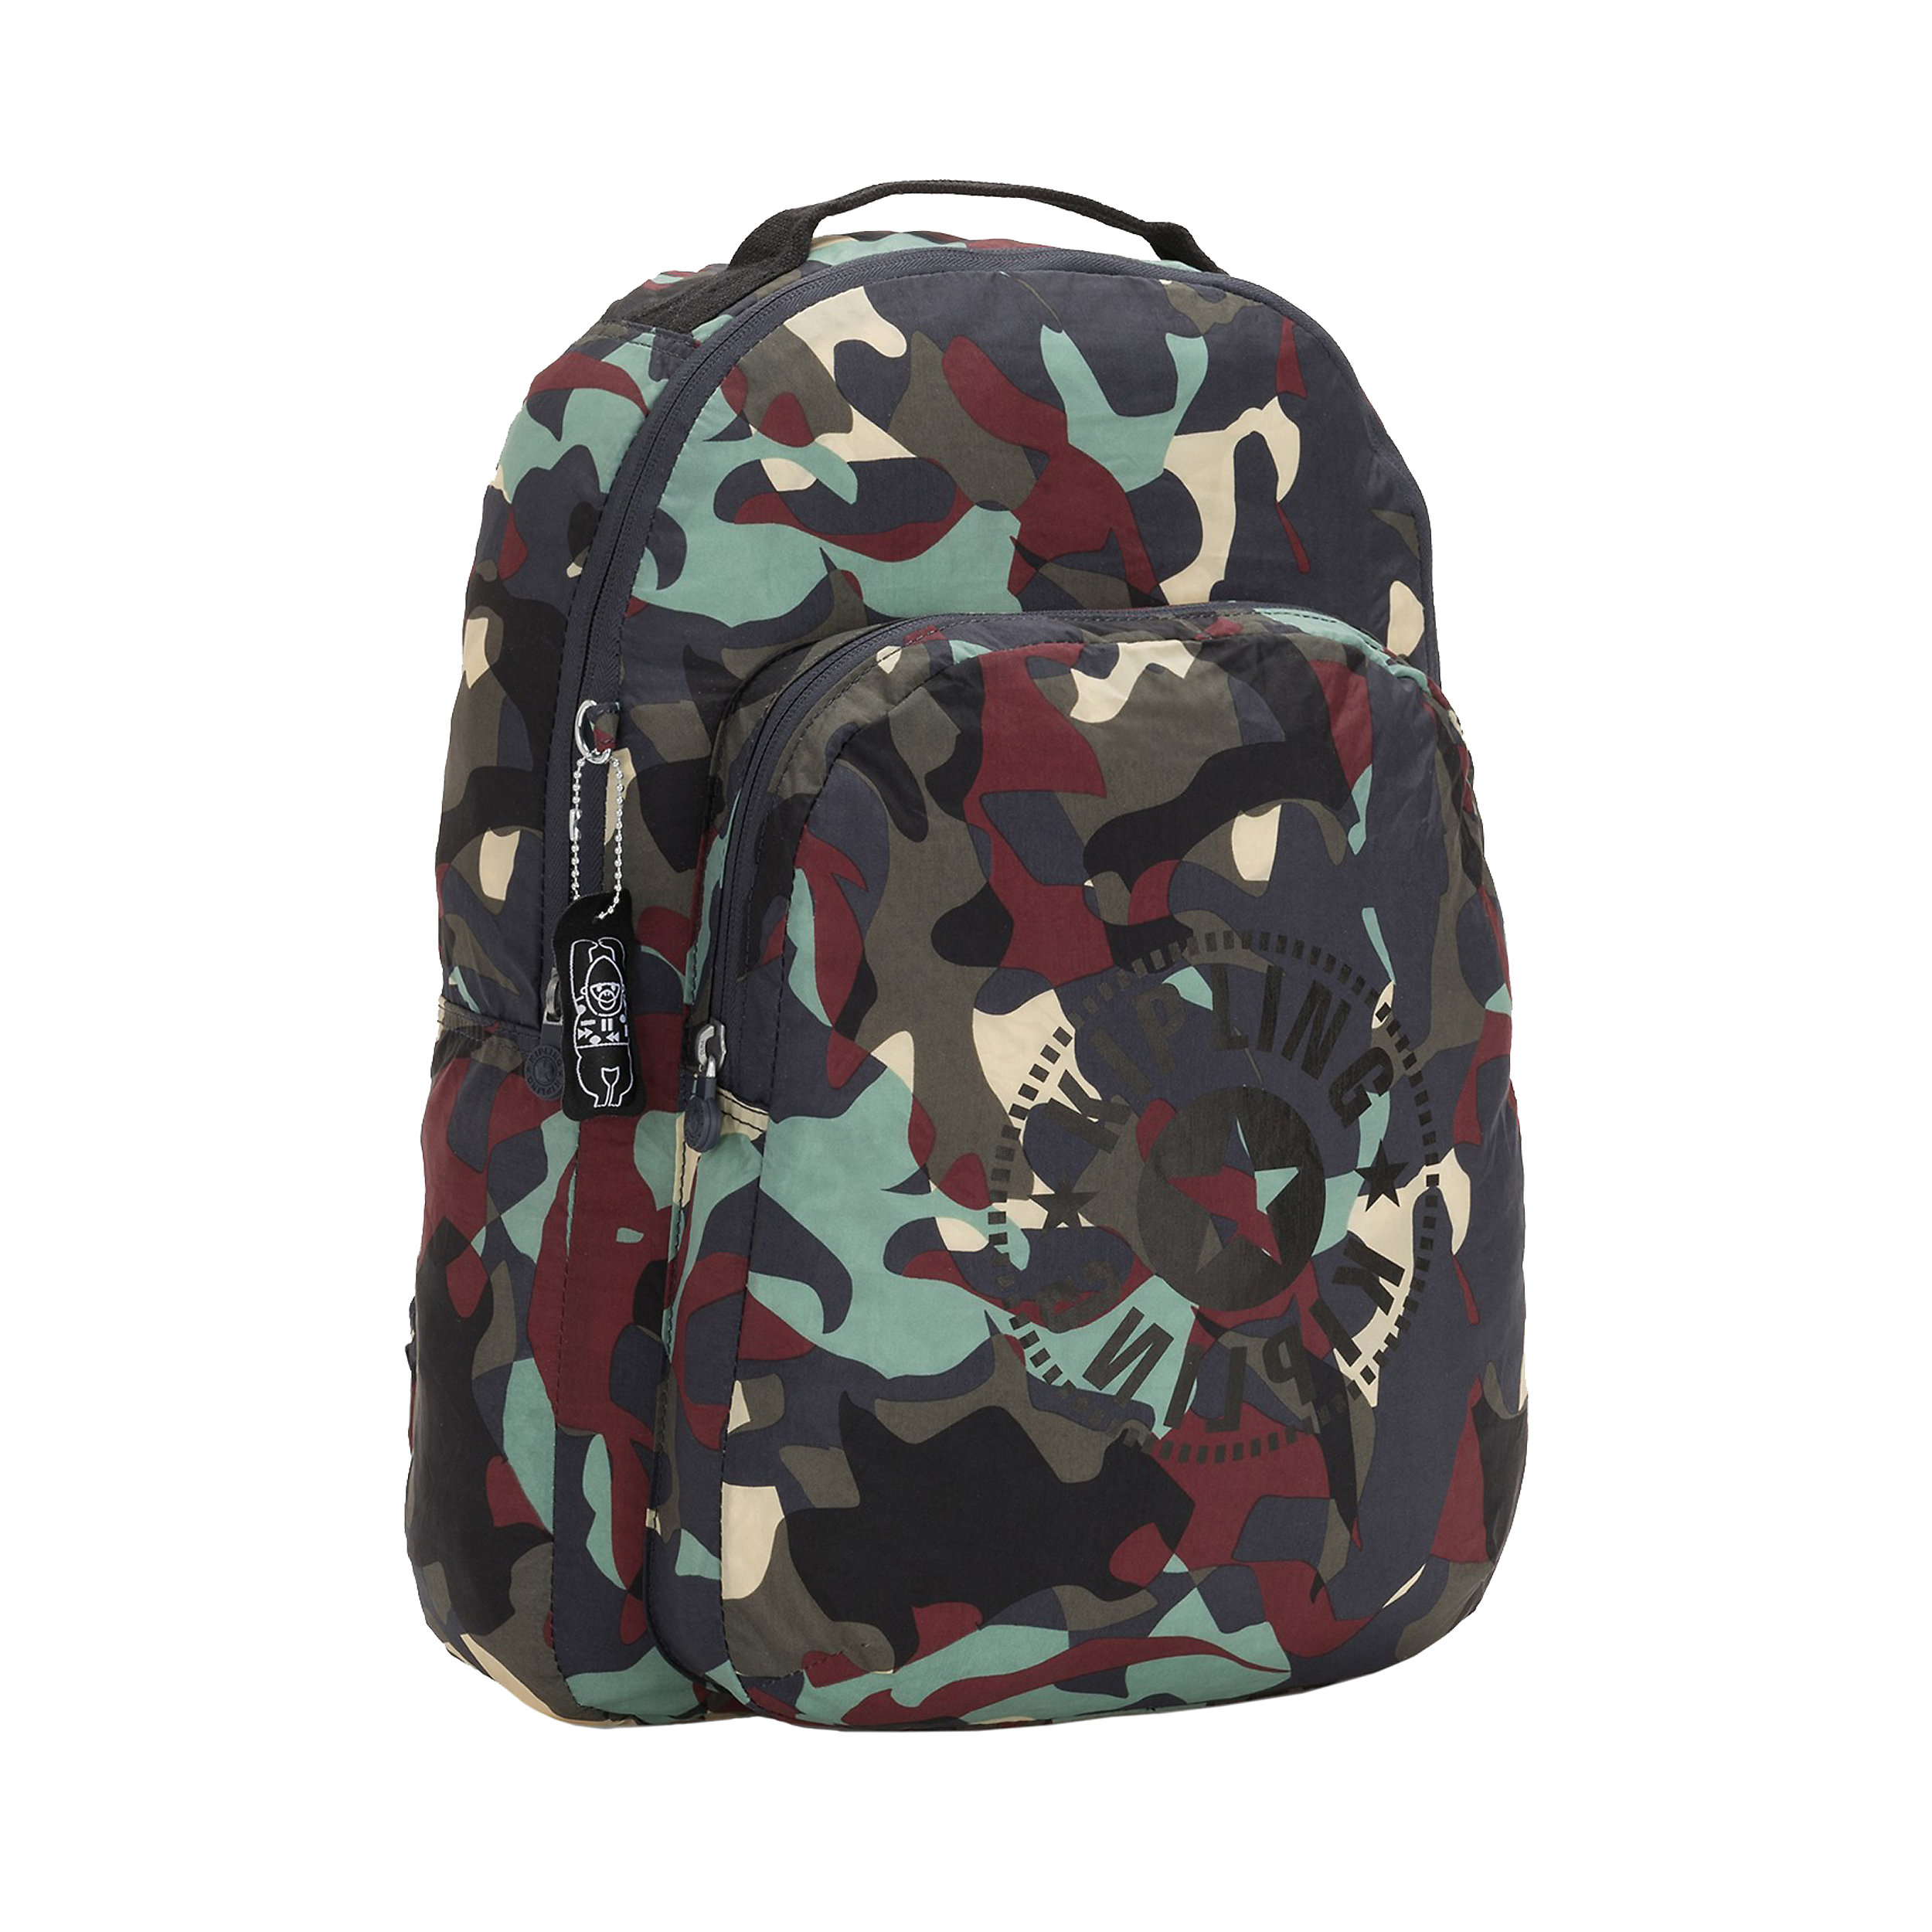 Rucksack Seoul Packable Bags 22.5 Liter